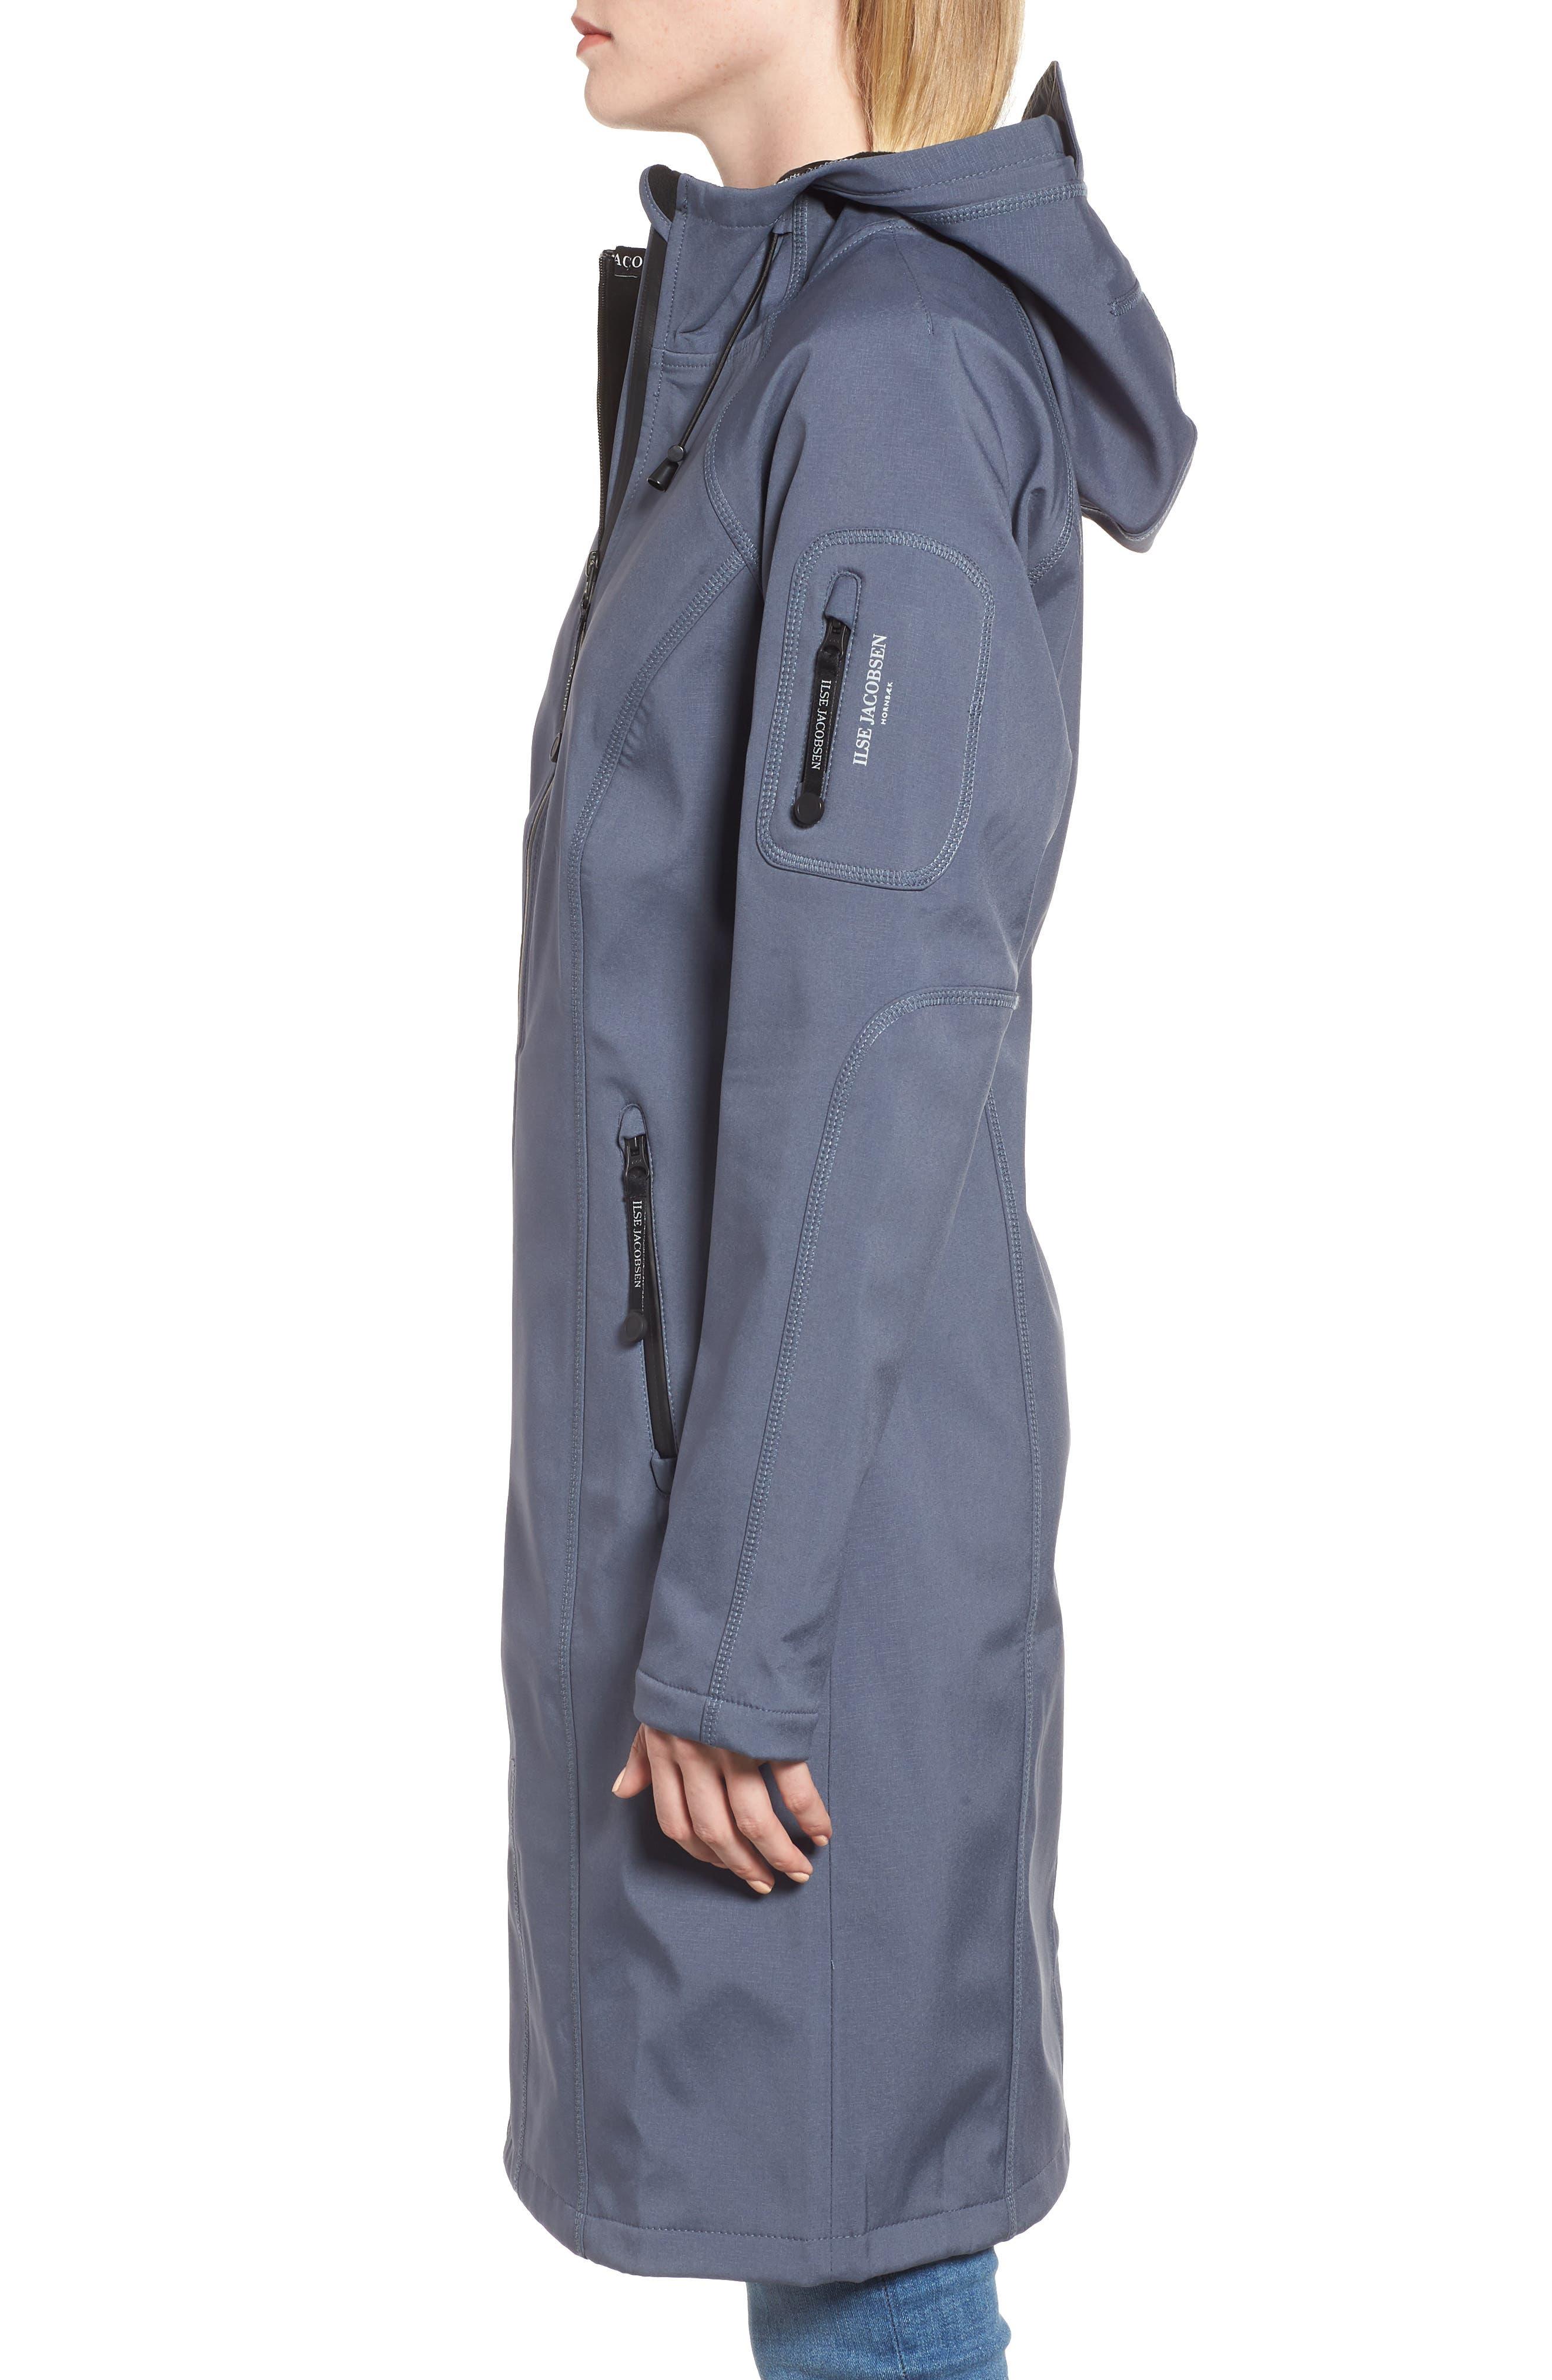 Long Hooded Raincoat,                             Alternate thumbnail 3, color,                             BLUE GRAYNESS